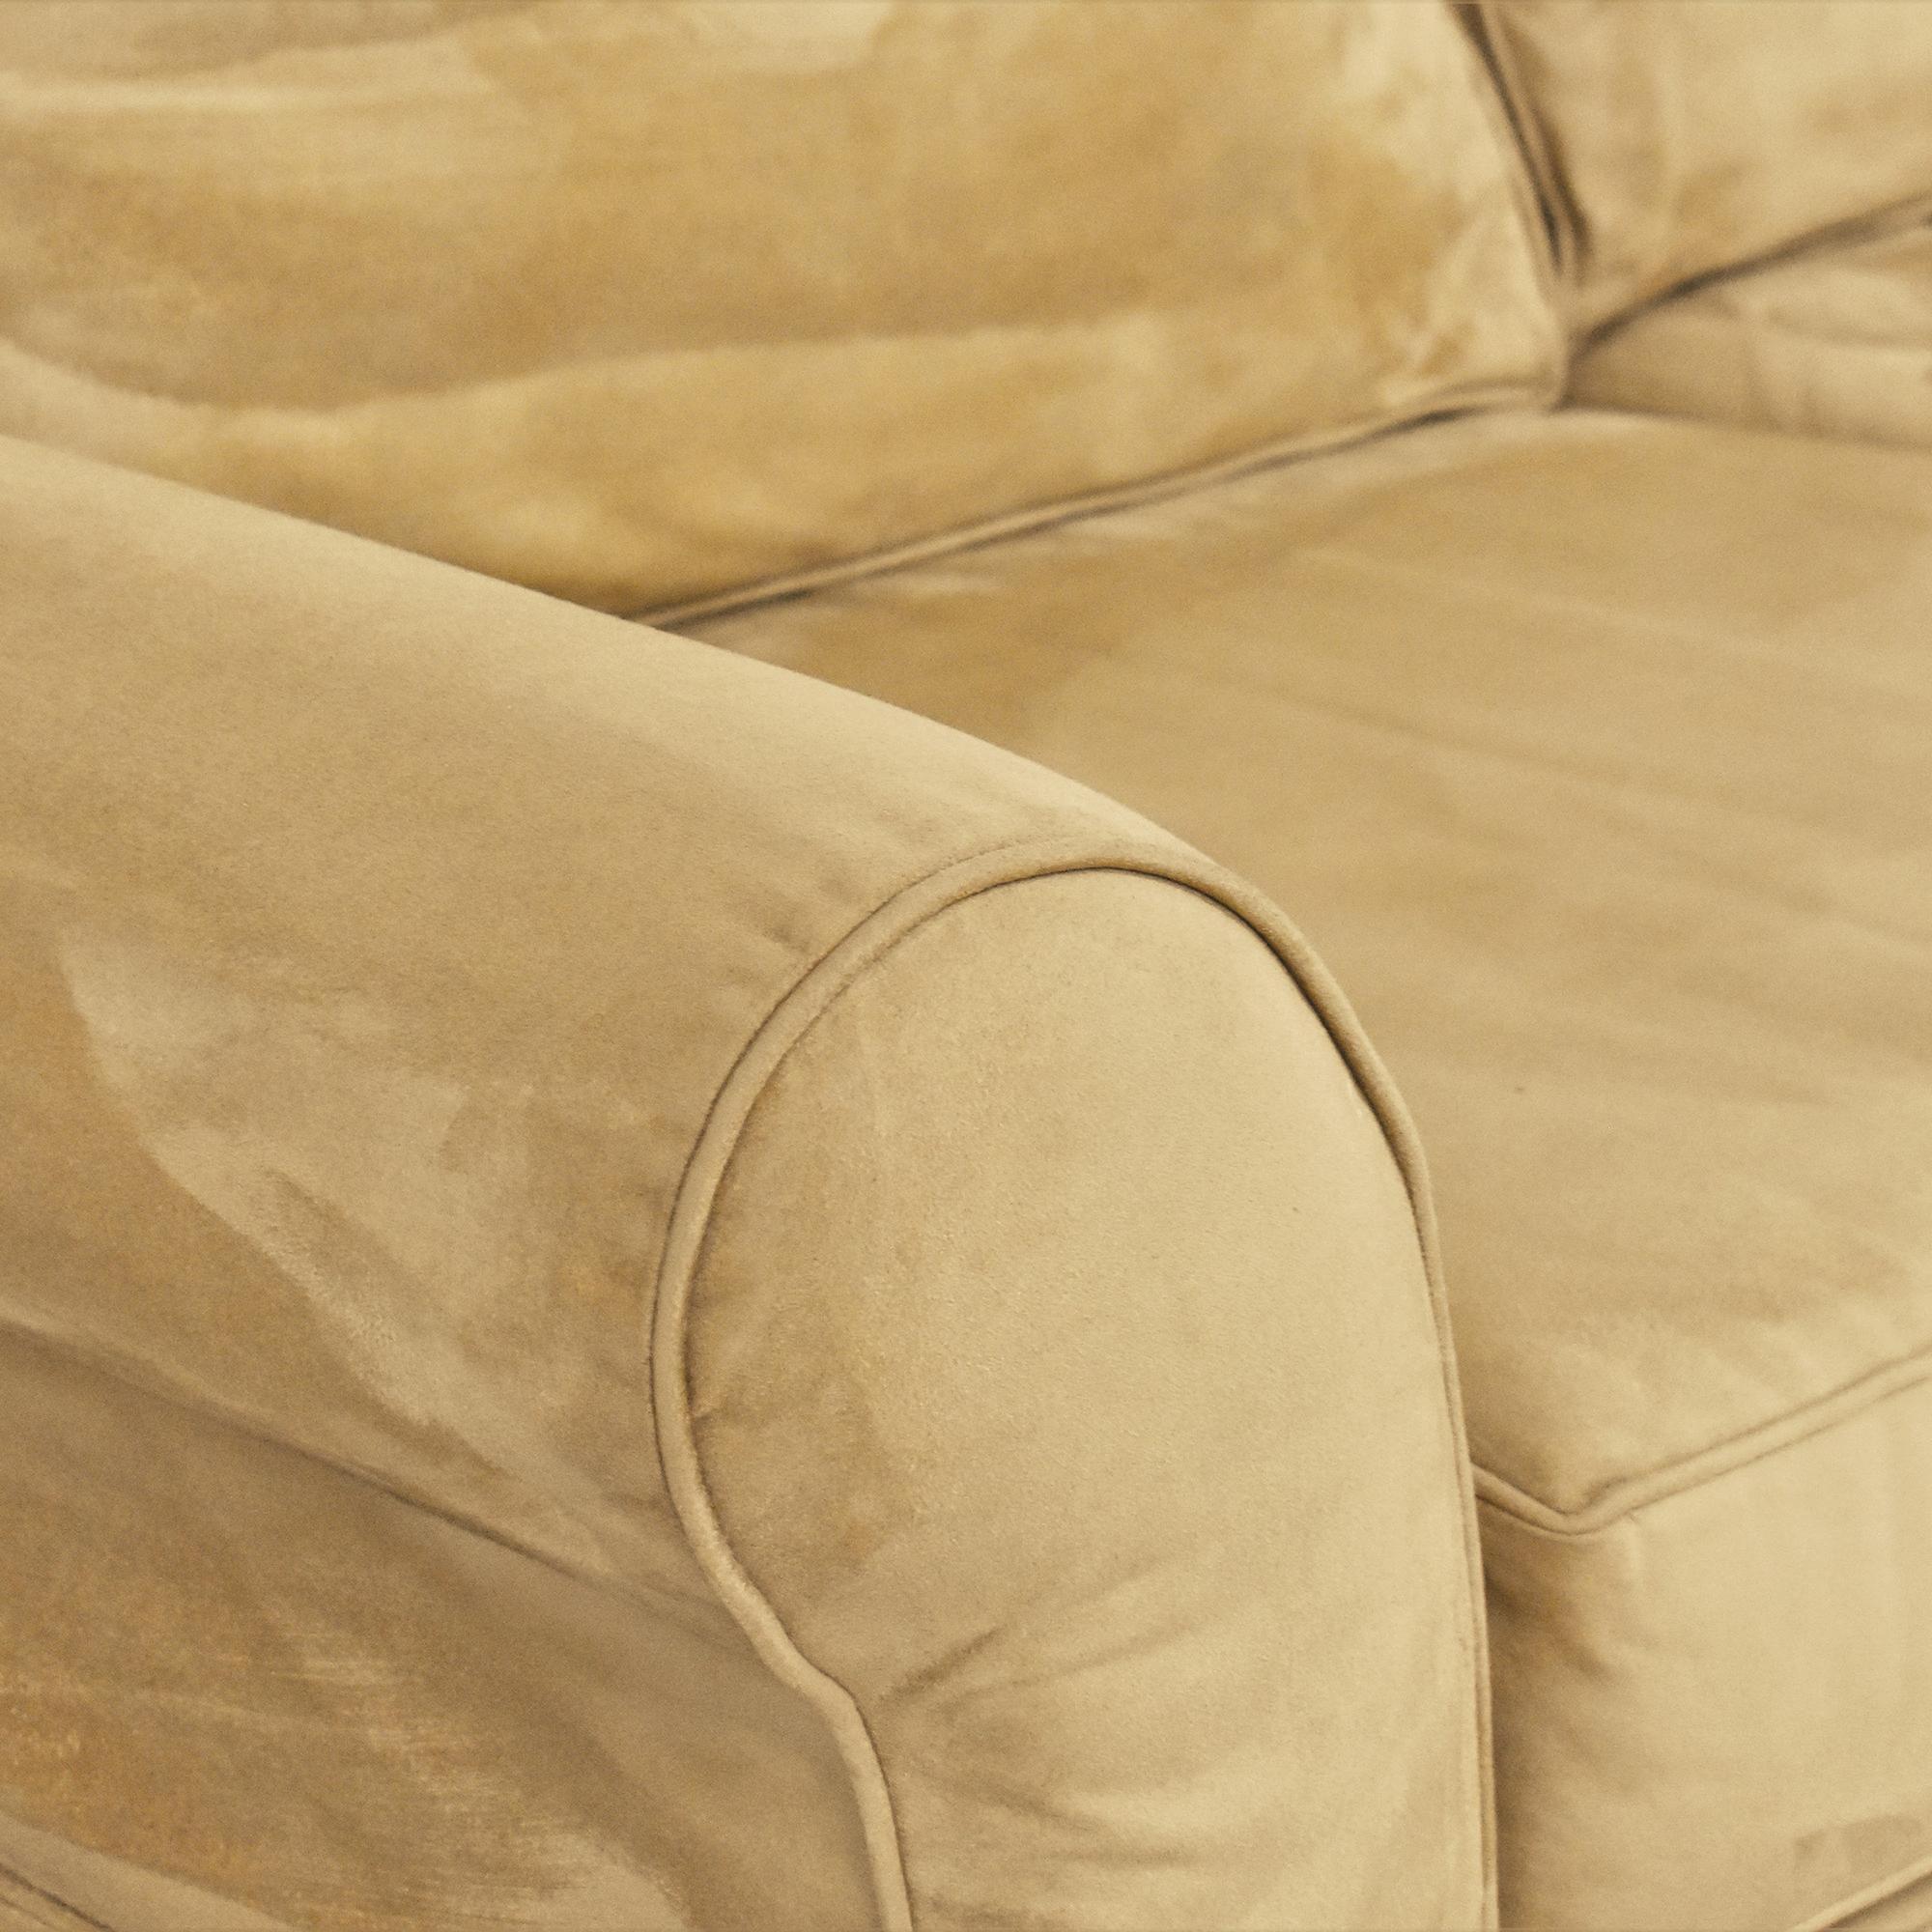 Pottery Barn Pottery Barn Comfort Roll Arm Slipcovered Sofa on sale